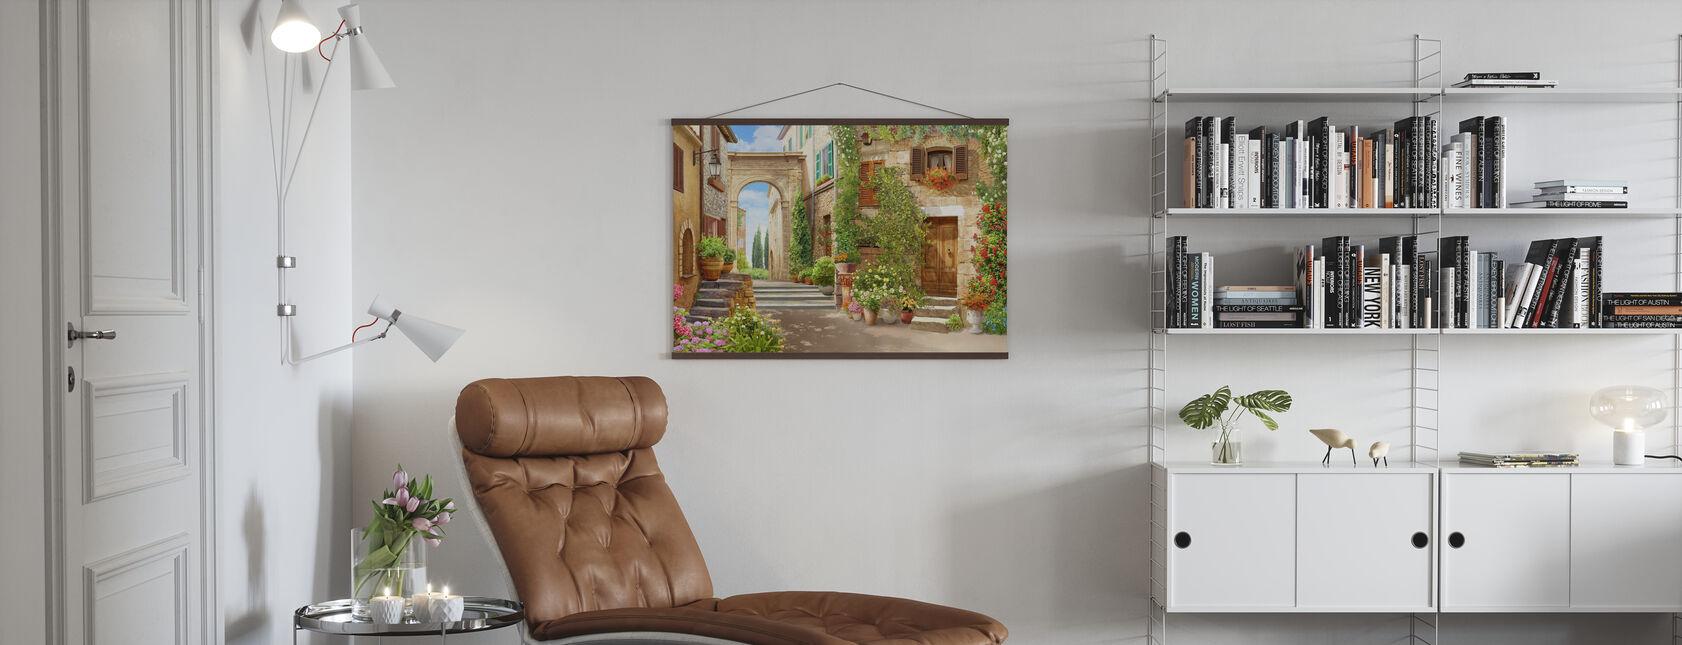 Courtyard II - Poster - Living Room